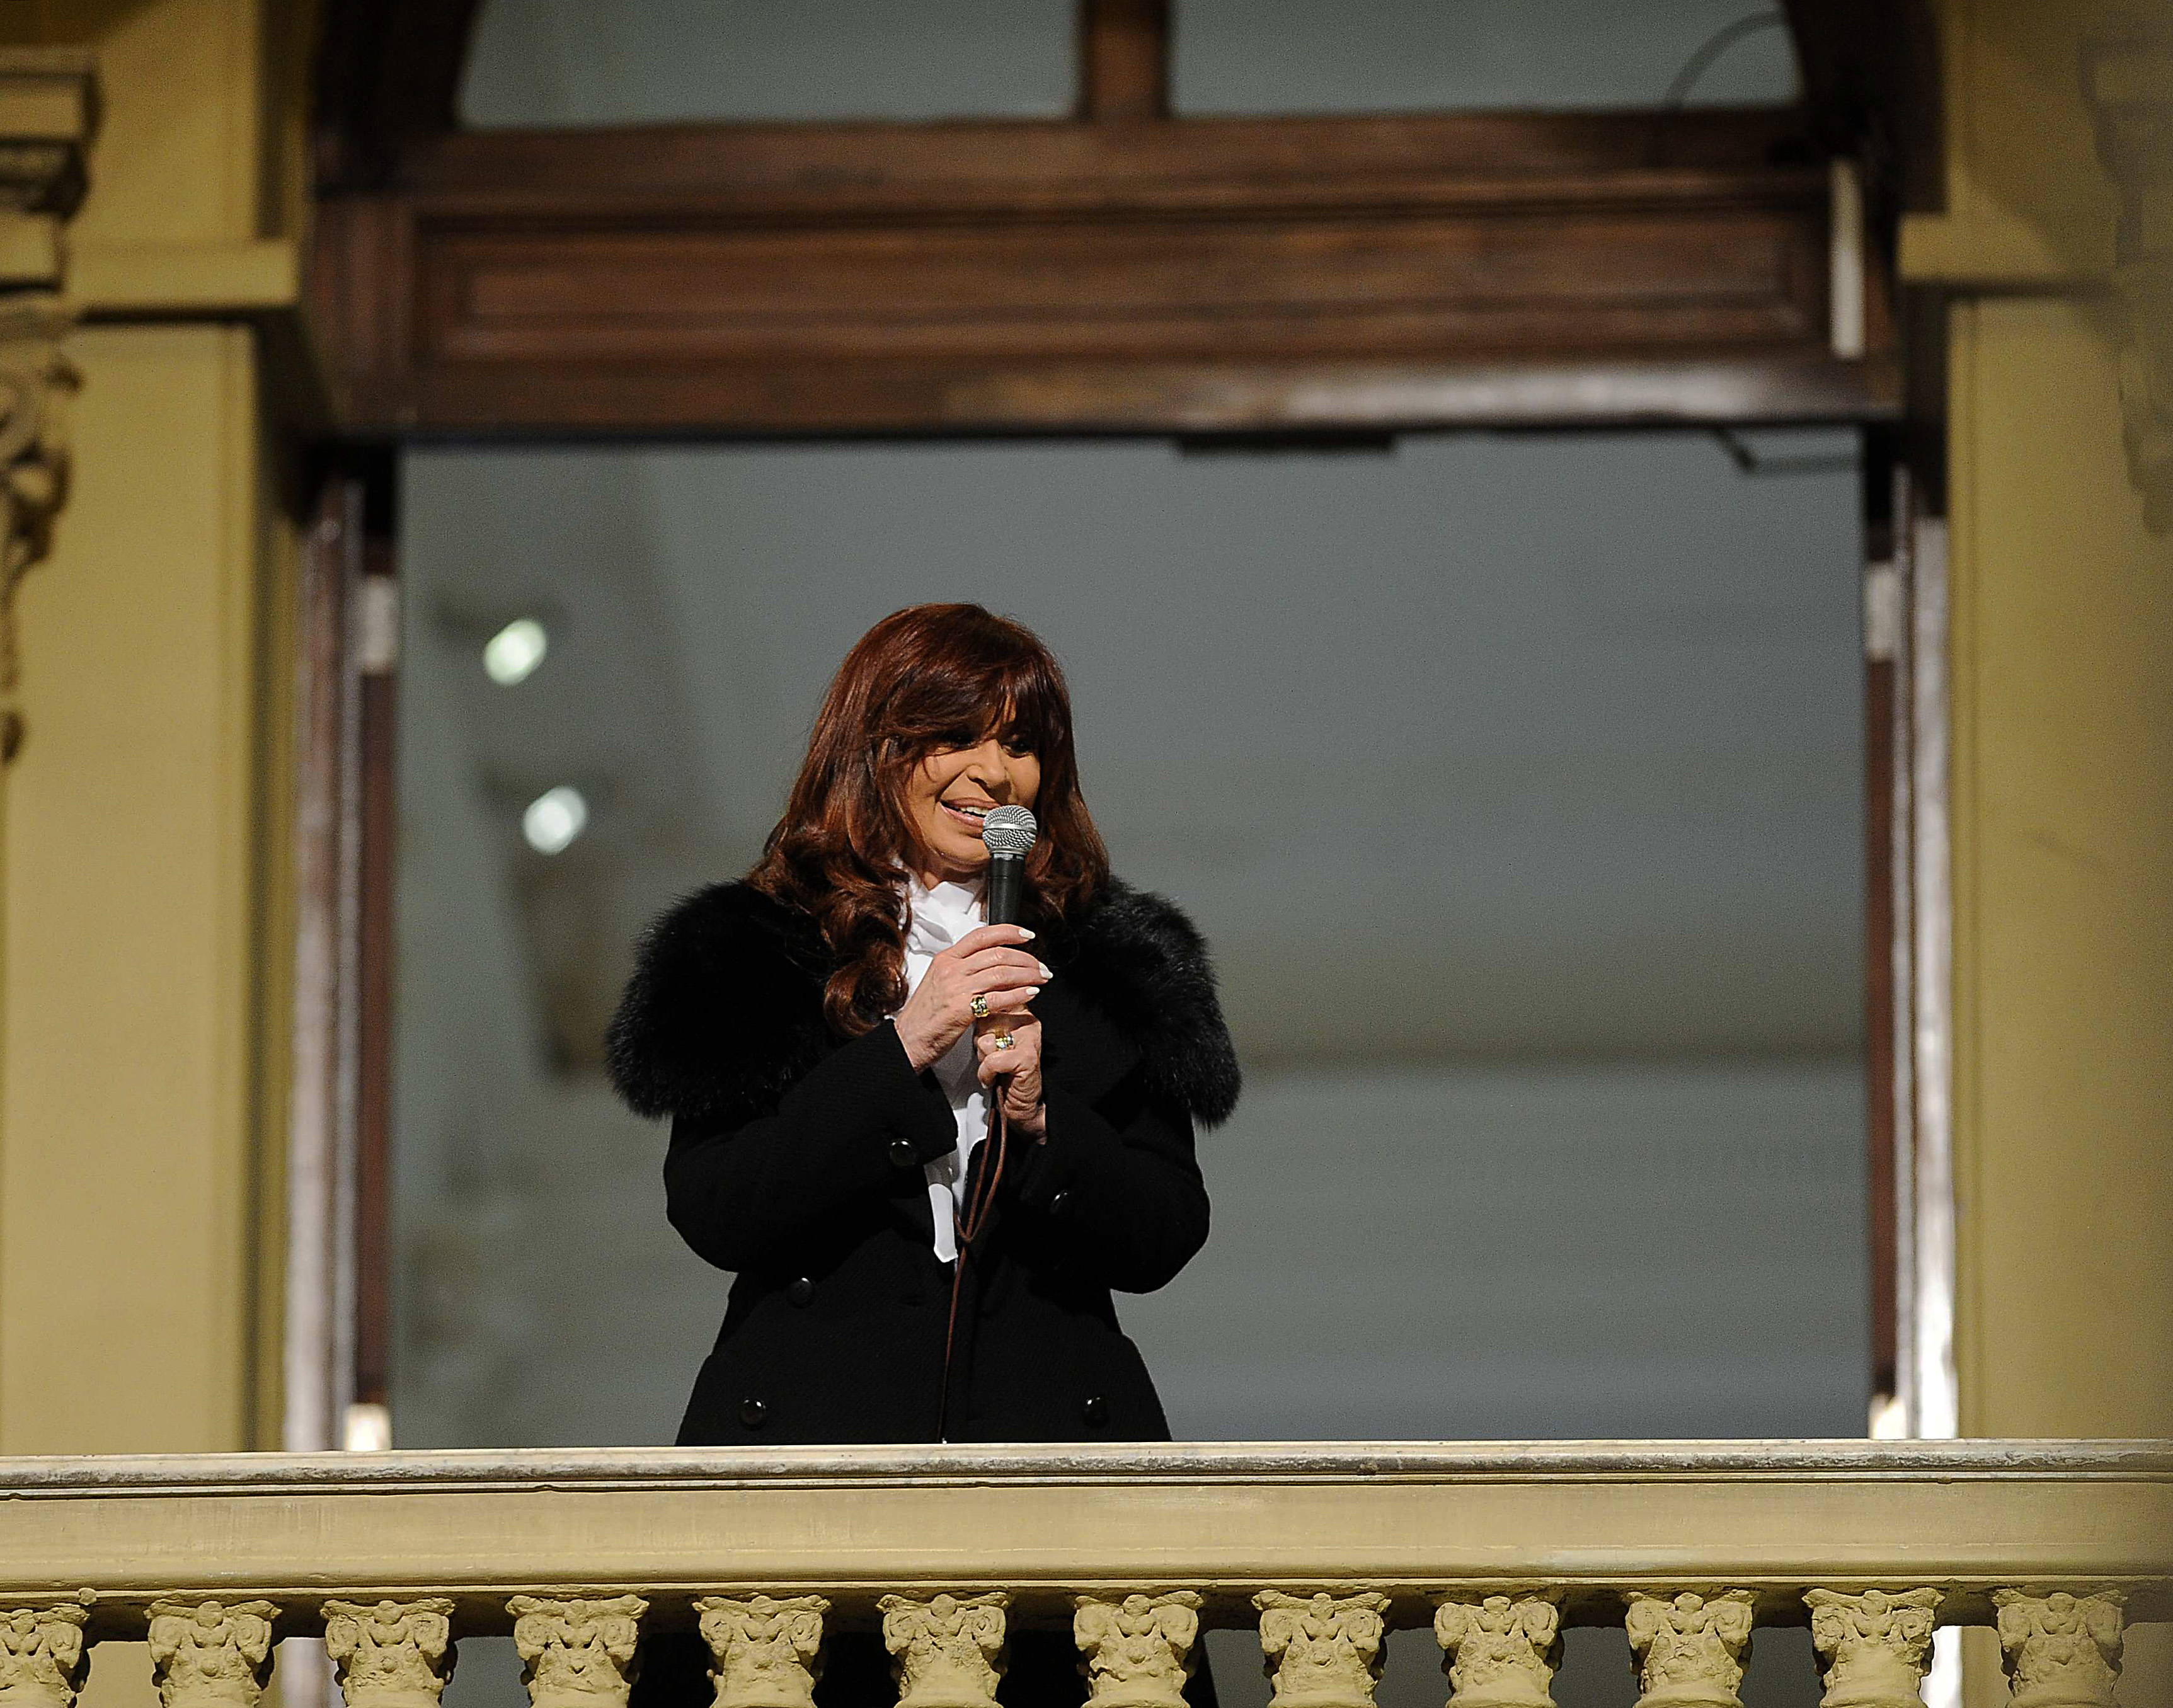 02-07-2015_buenos_aires_la_presidenta_cristina (3)